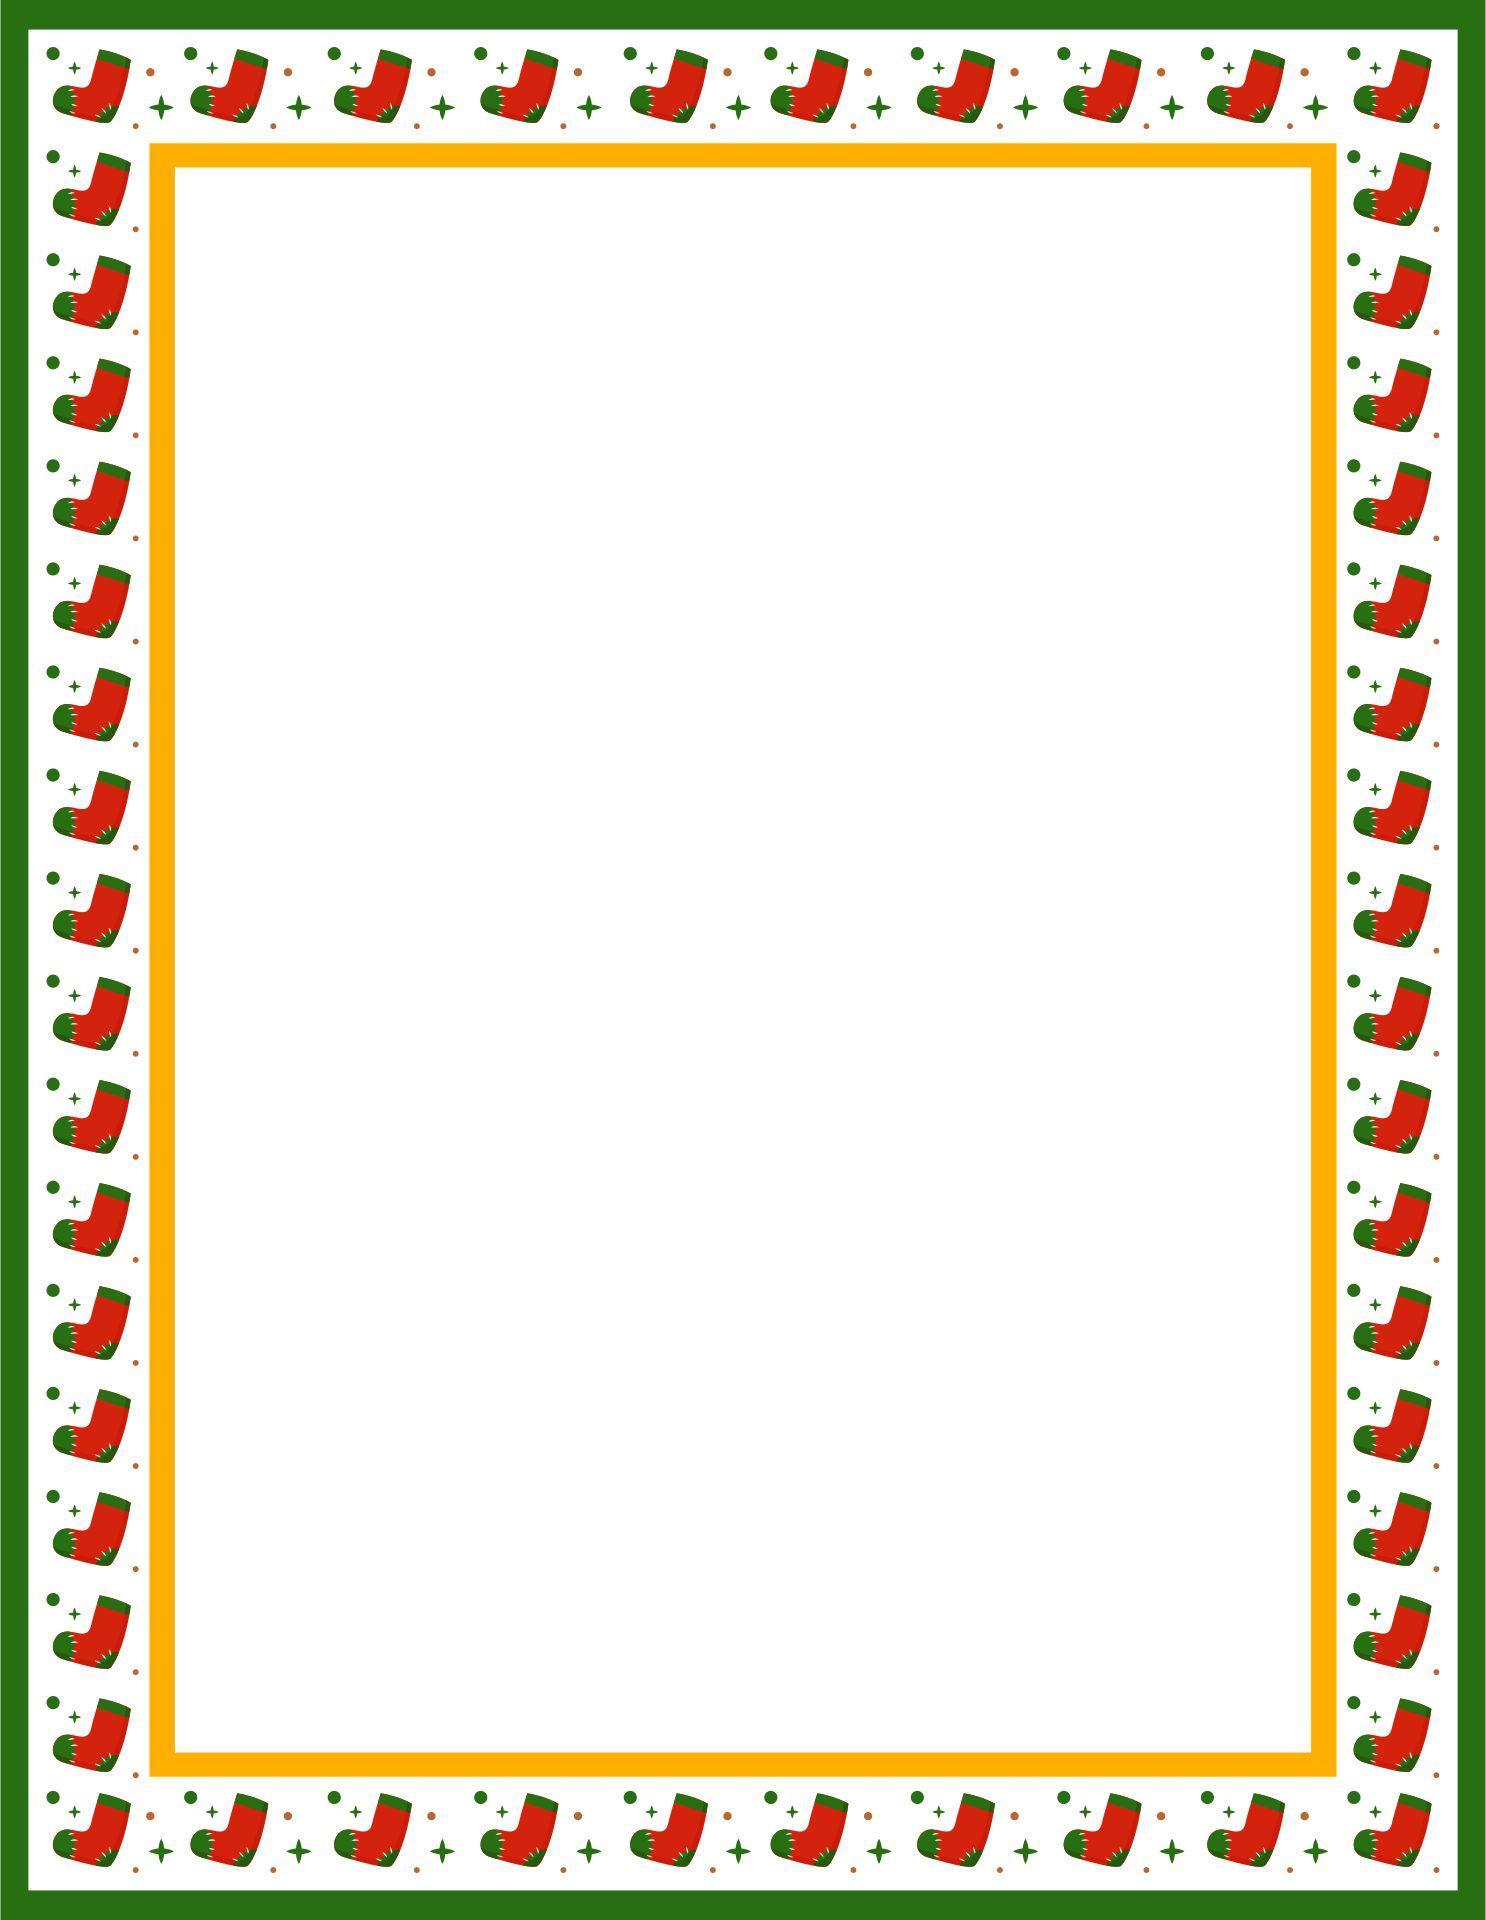 5 Images of Free Printable Christmas Border Templates